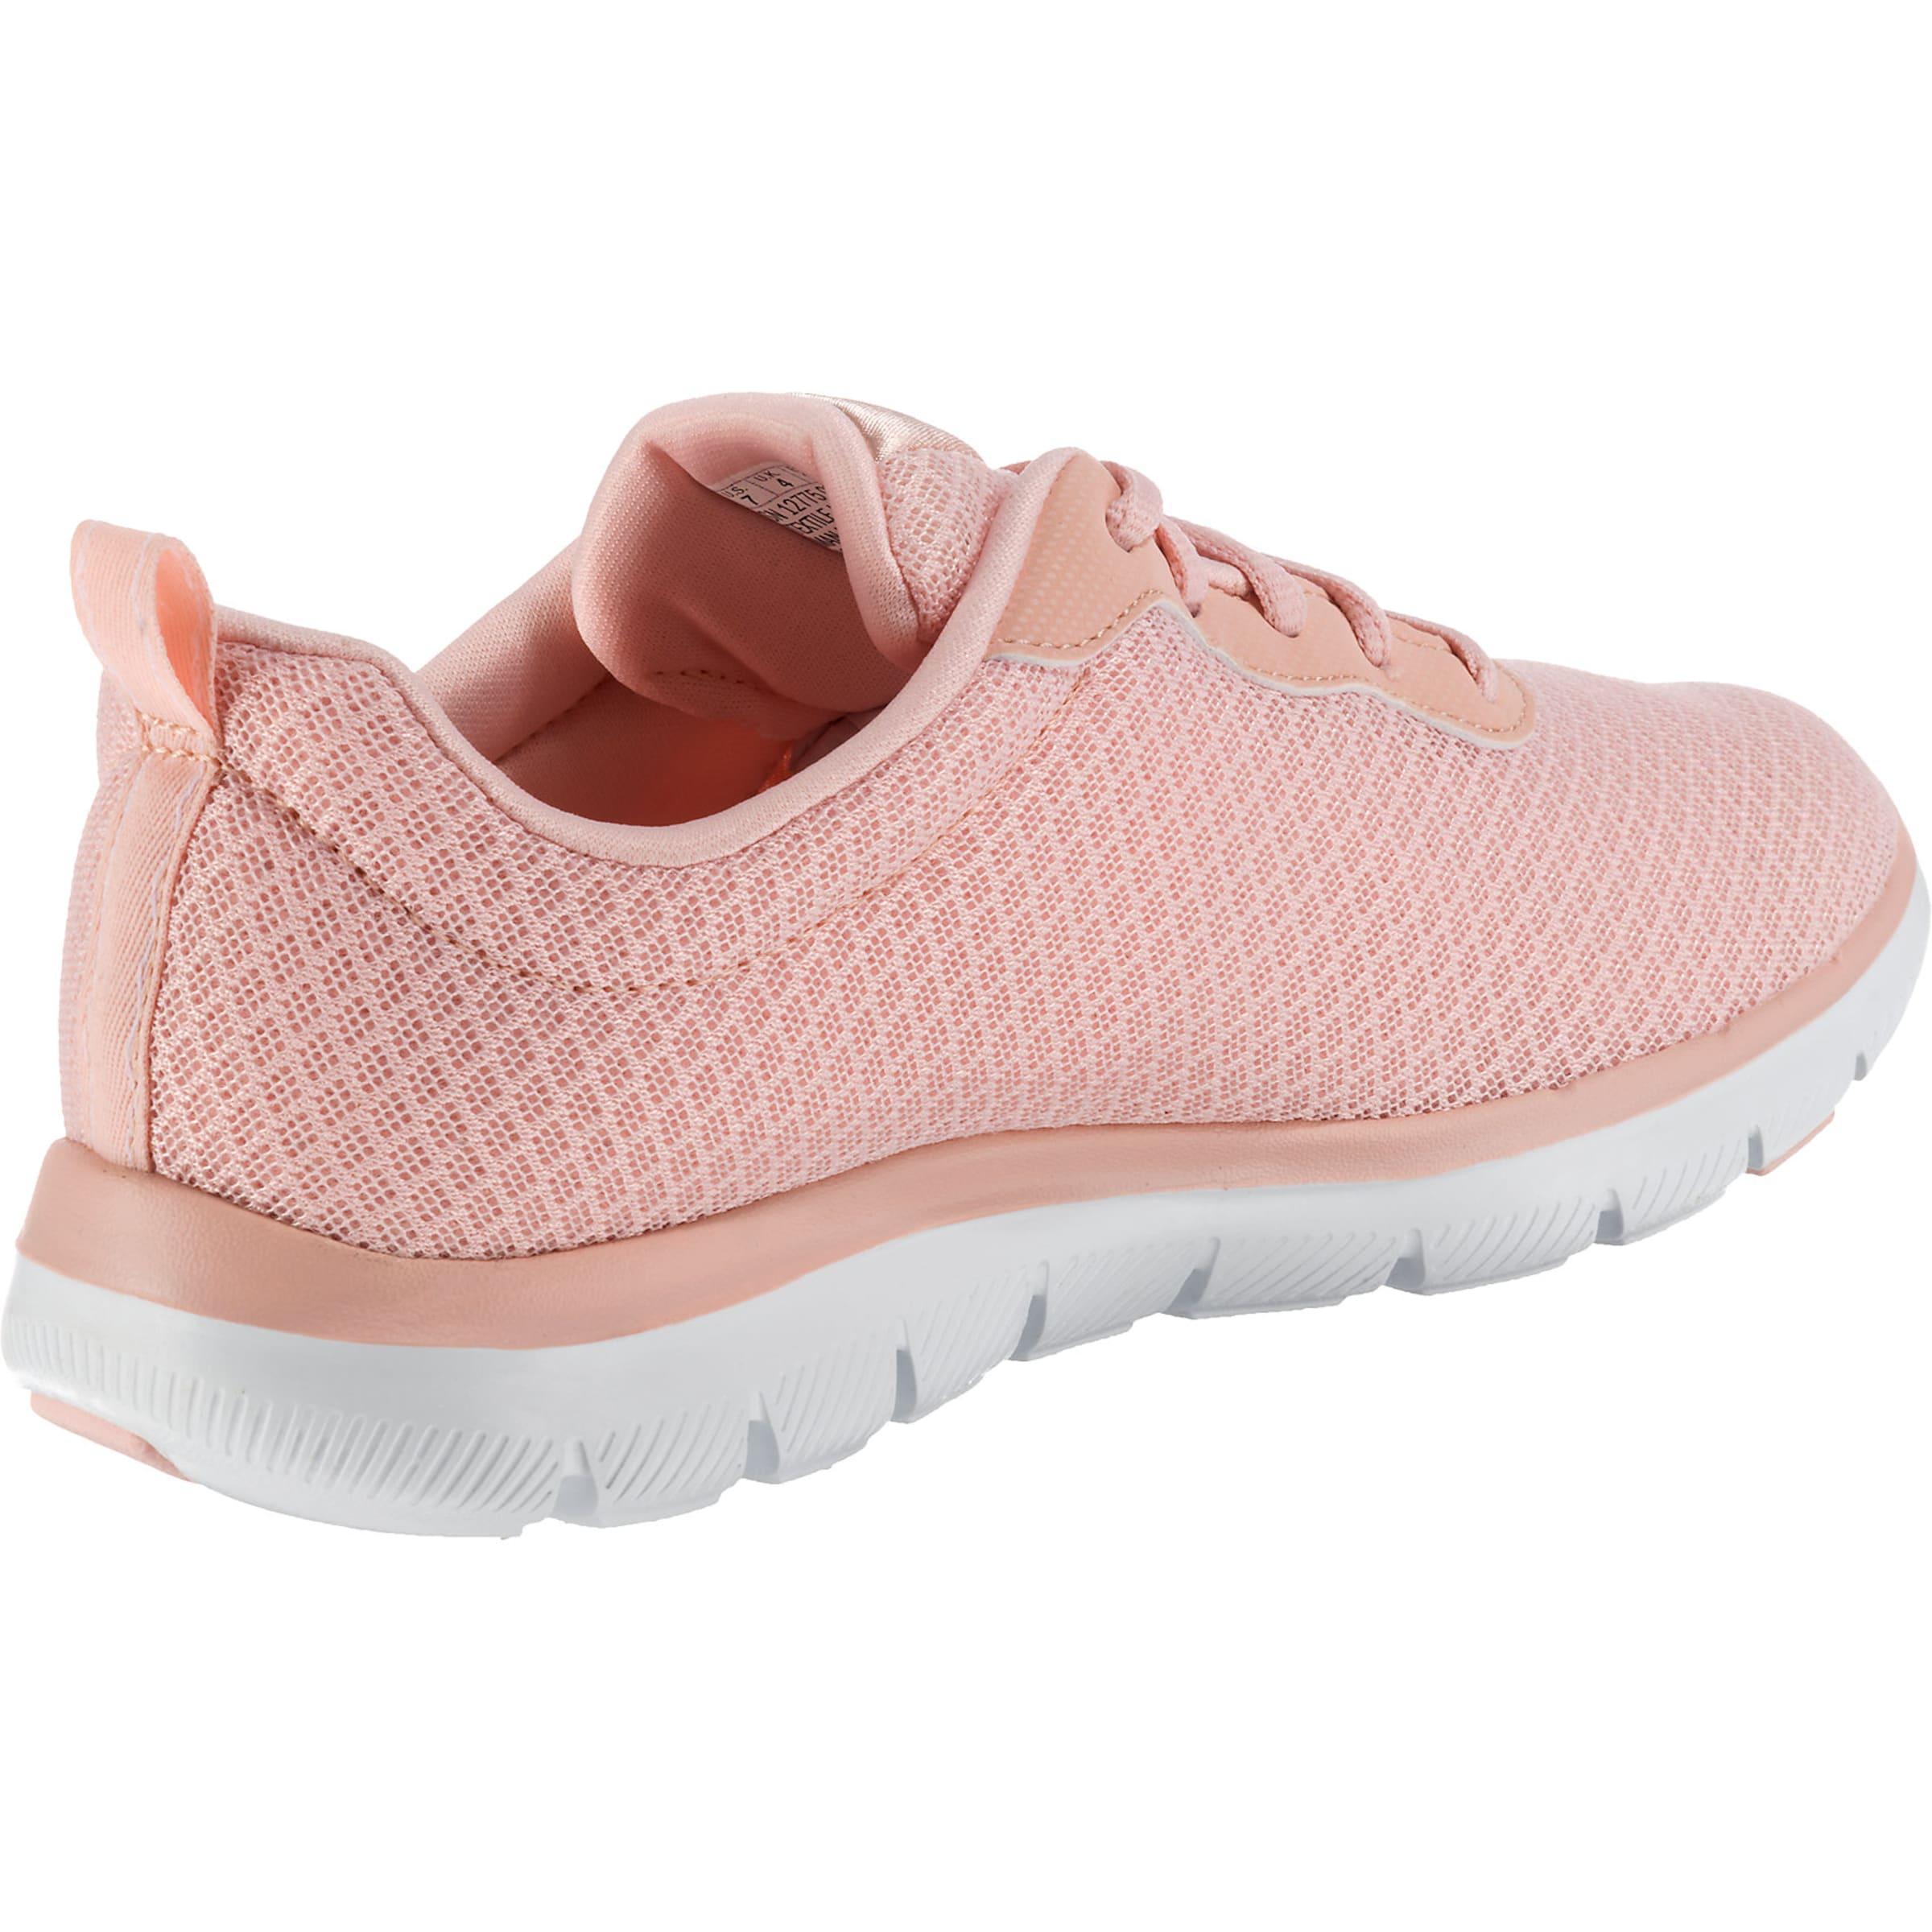 Skechers Sneaker 0 2 'flex In Newsmaker' Rosa Appeal PiTOXkZu